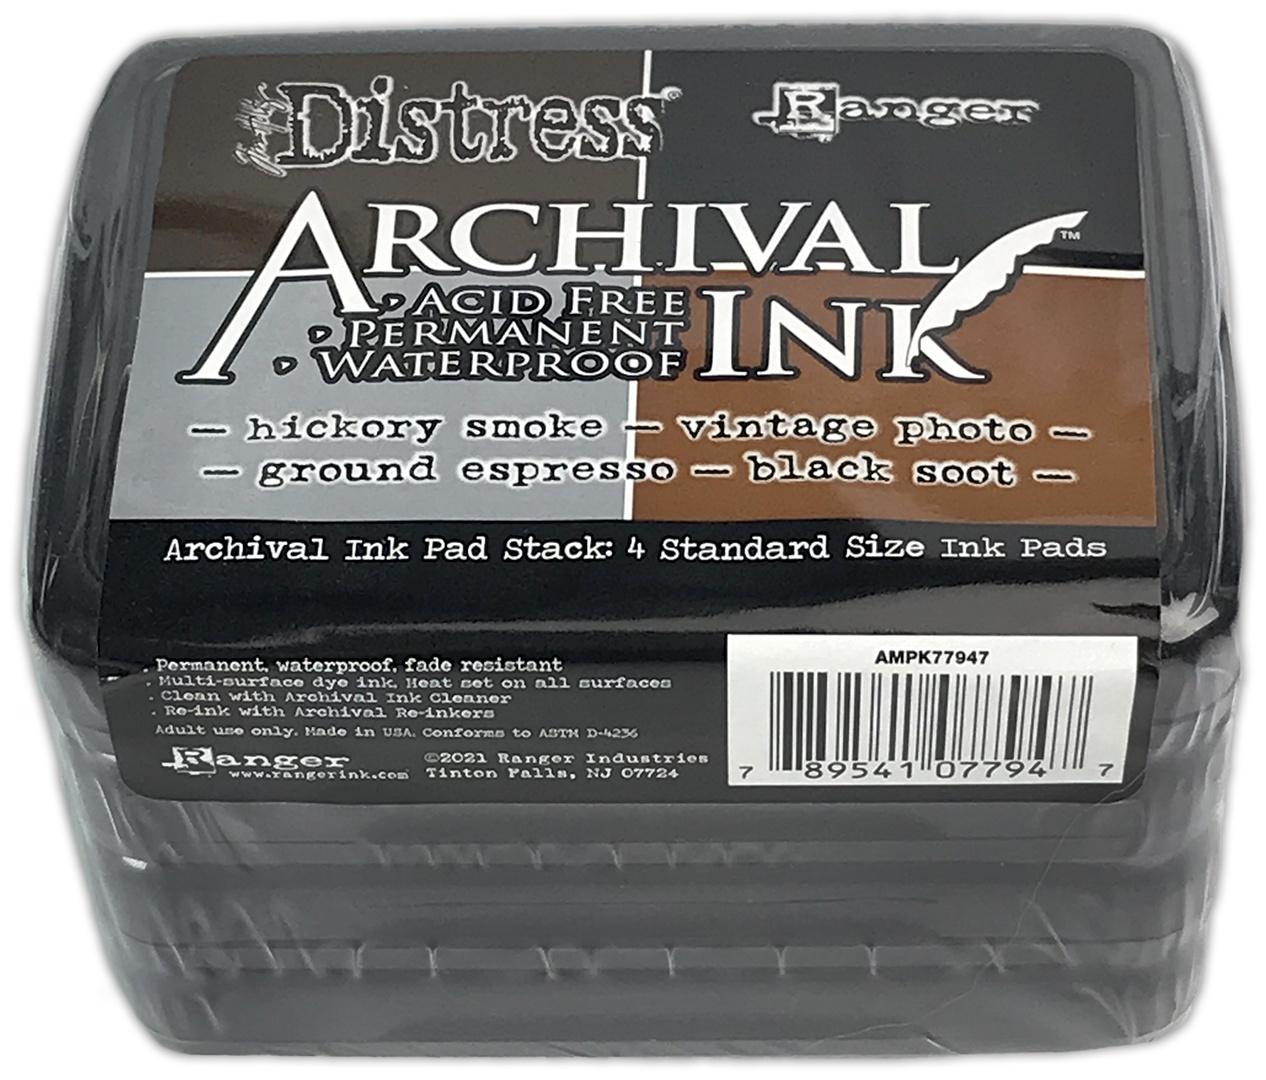 Tim Holtz Distress Archival Ink Pad Stack-Basics